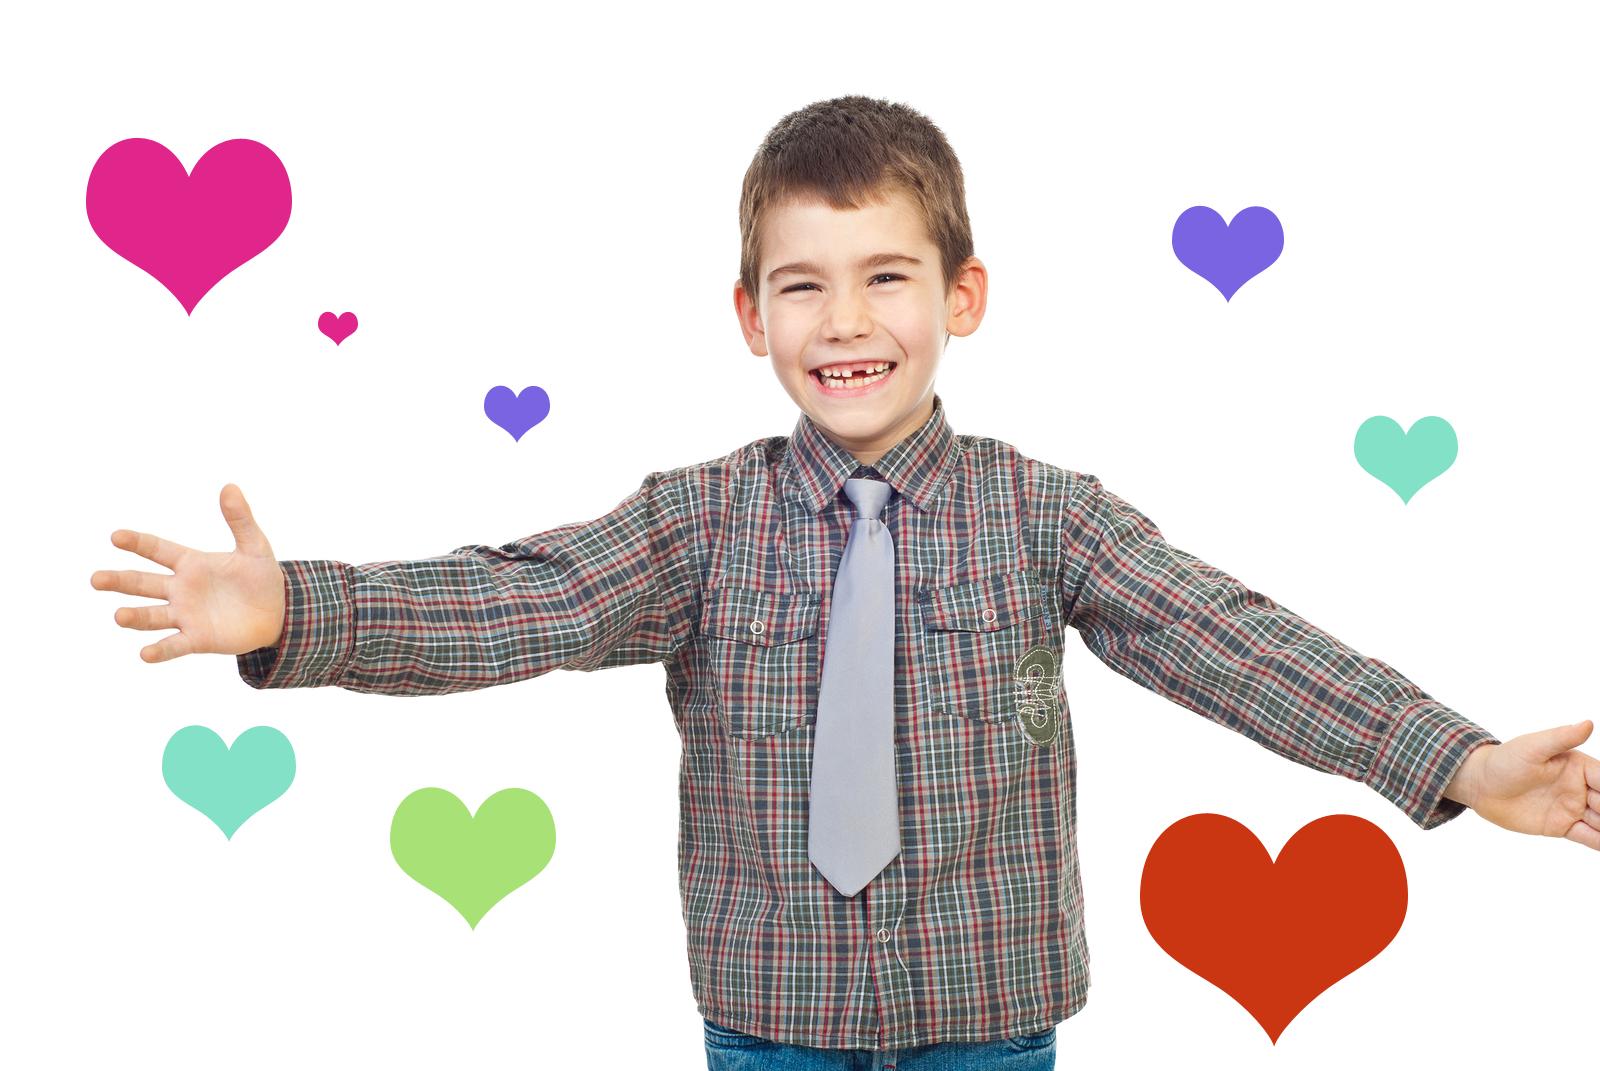 Send A Hug Valentines Day Motor Skills Crafts